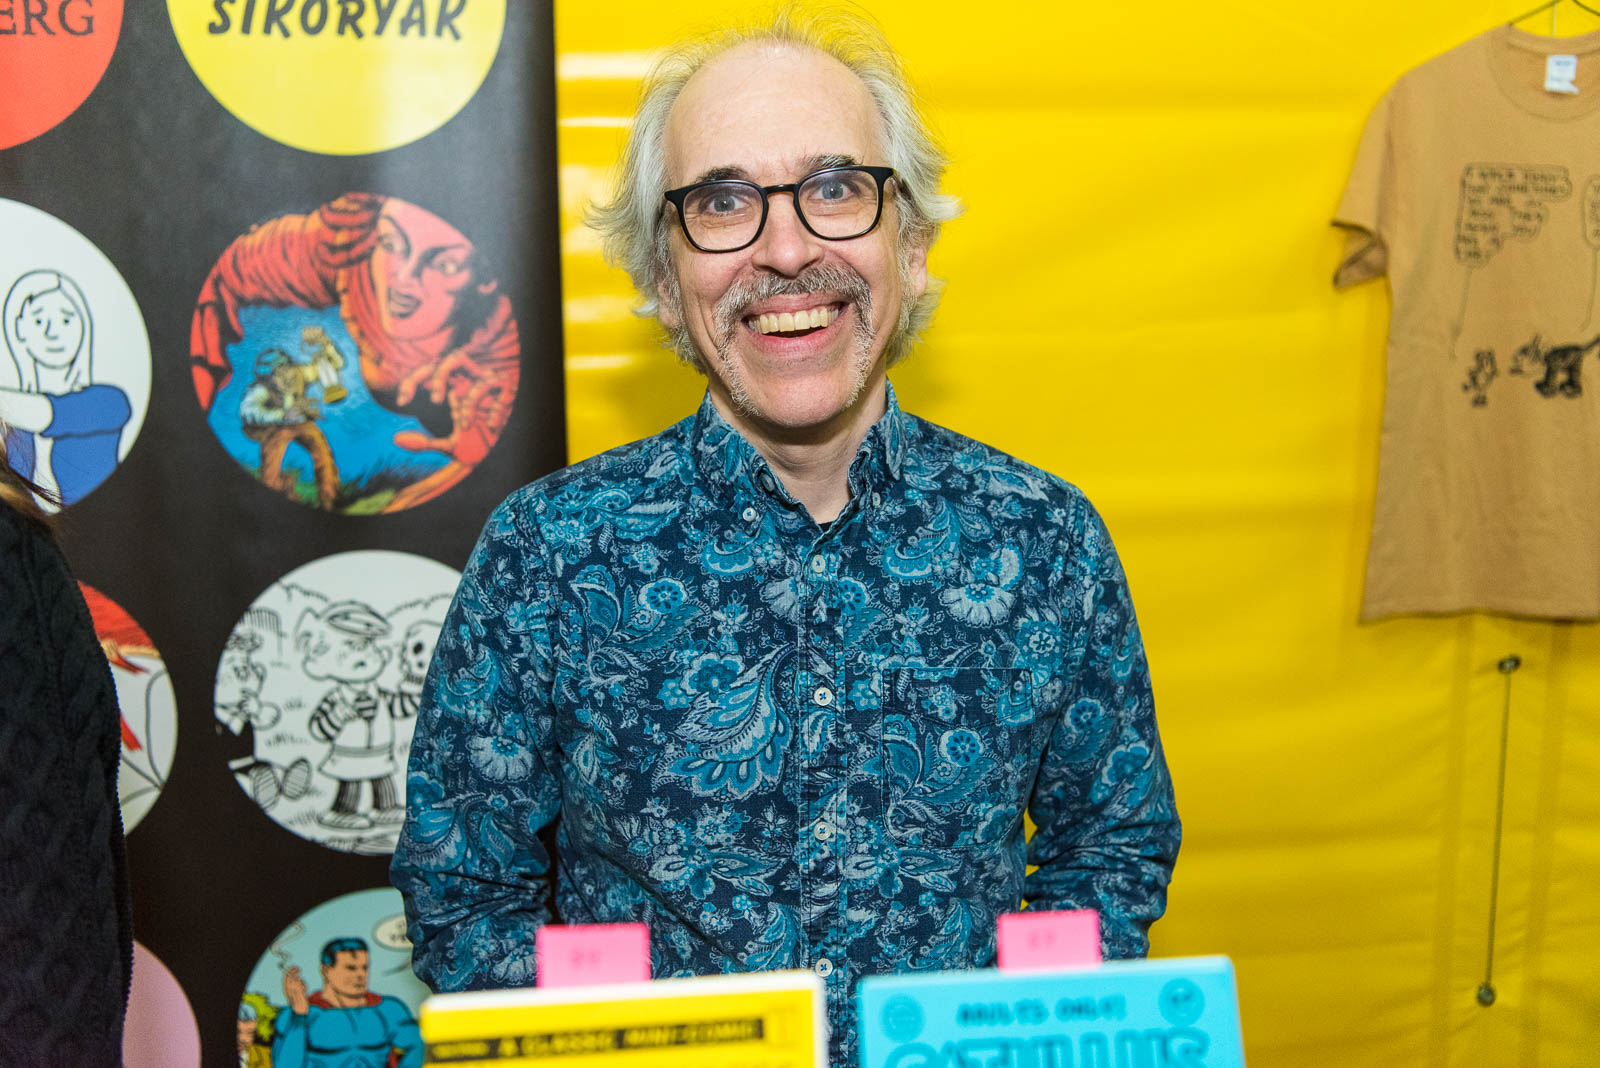 R. Sikoryak during Comic Arts Brooklyn on Sunday, November 11, 2018.